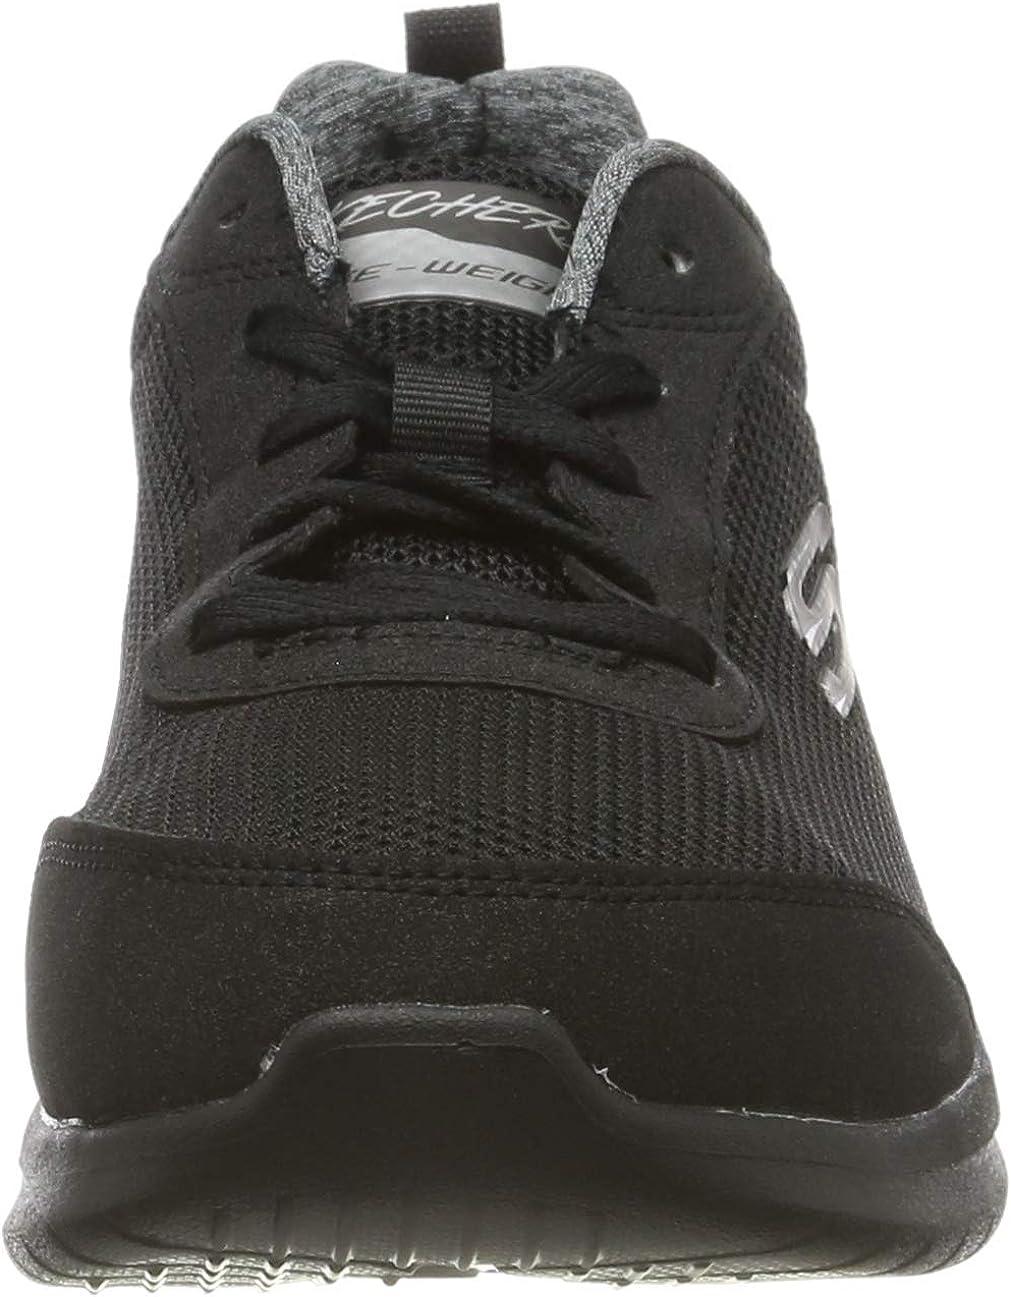 Skechers Ultra Flex 2.0, Sneaker Donna Black Mesh Duraleather Trim Bbk